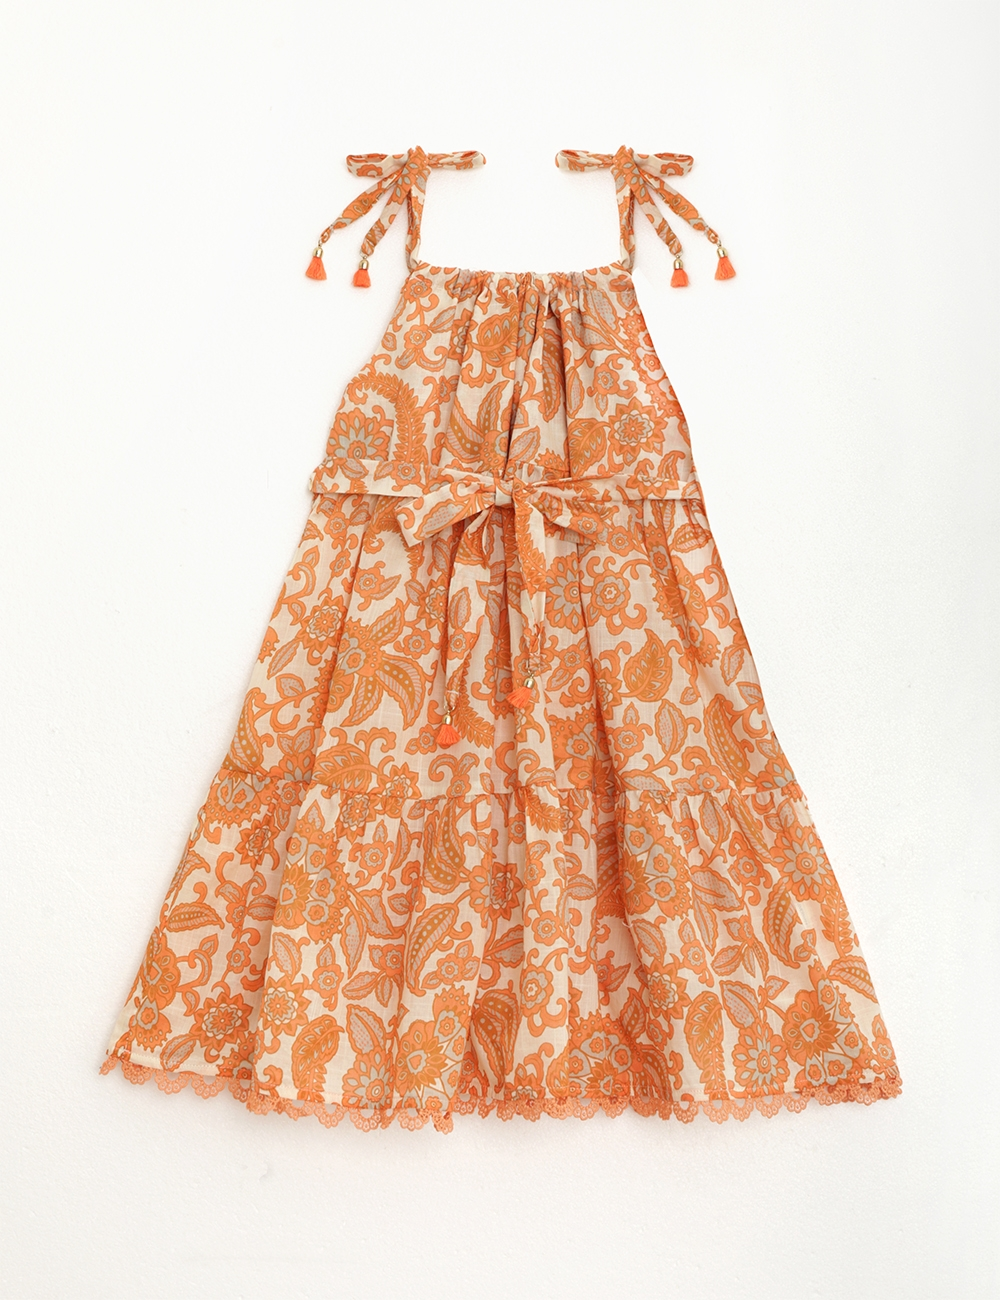 Peggy Tie Shoulder Bow Dress